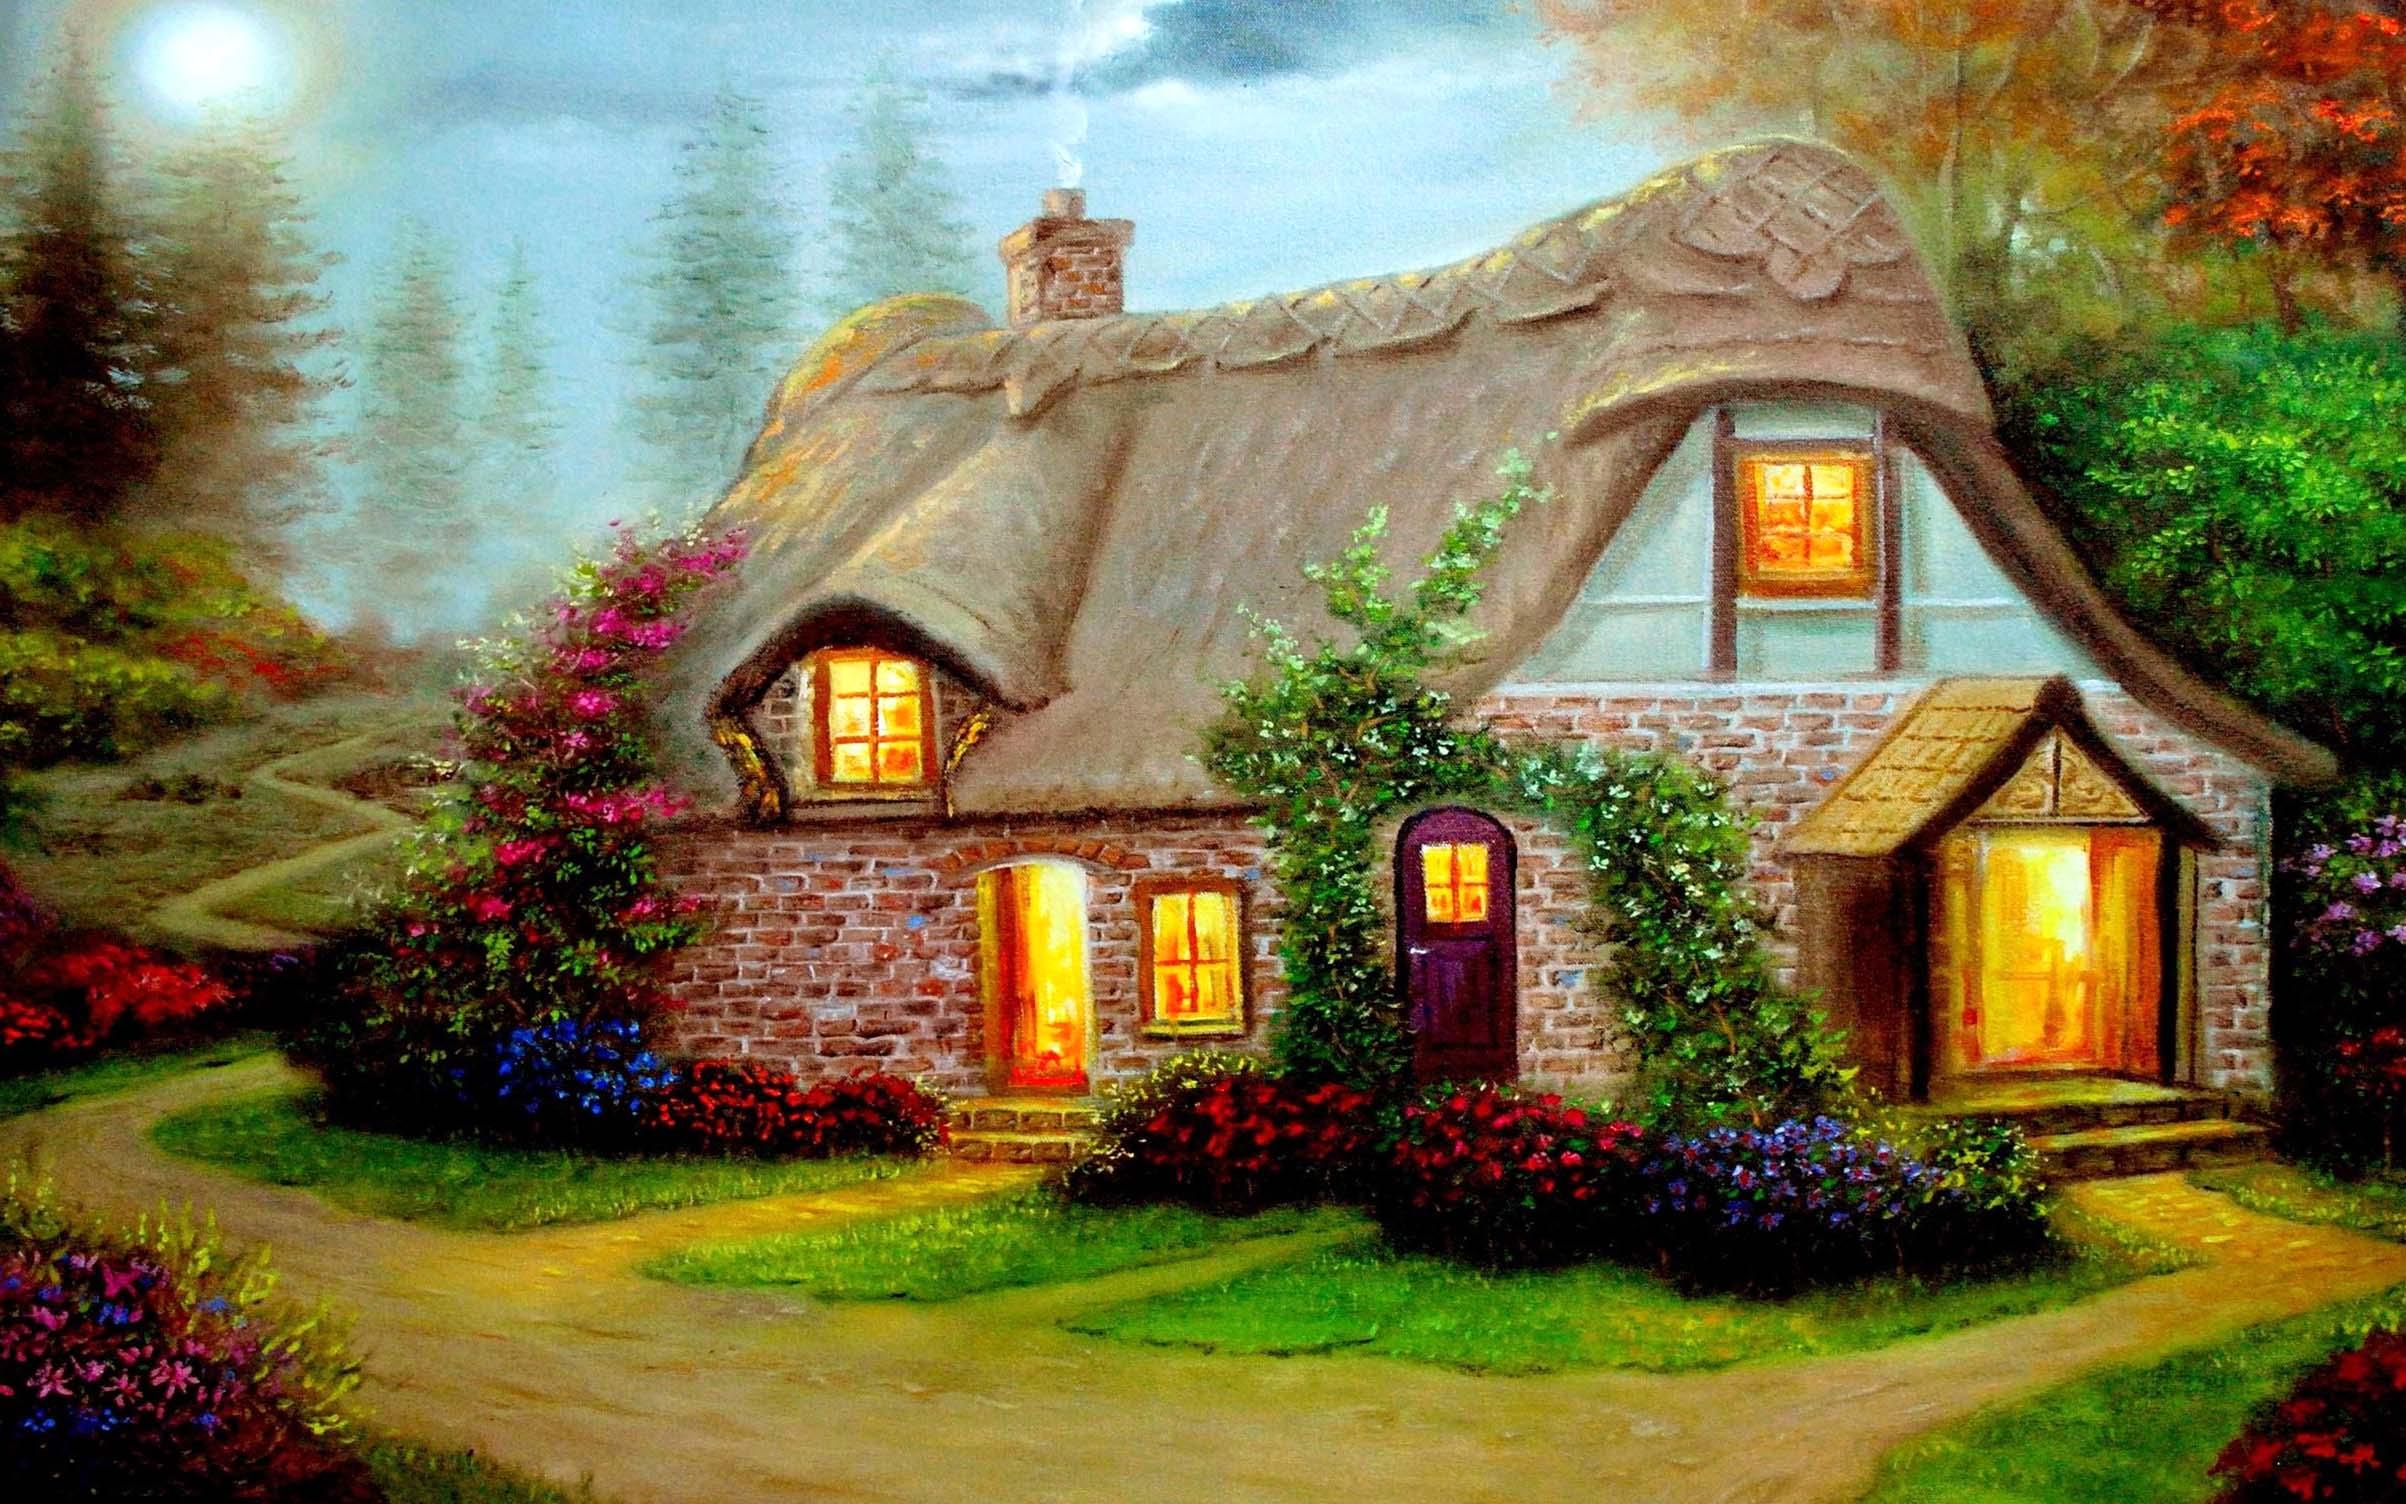 Beautiful Cottage High Definition Widescreen Wallpaper 2406x1504